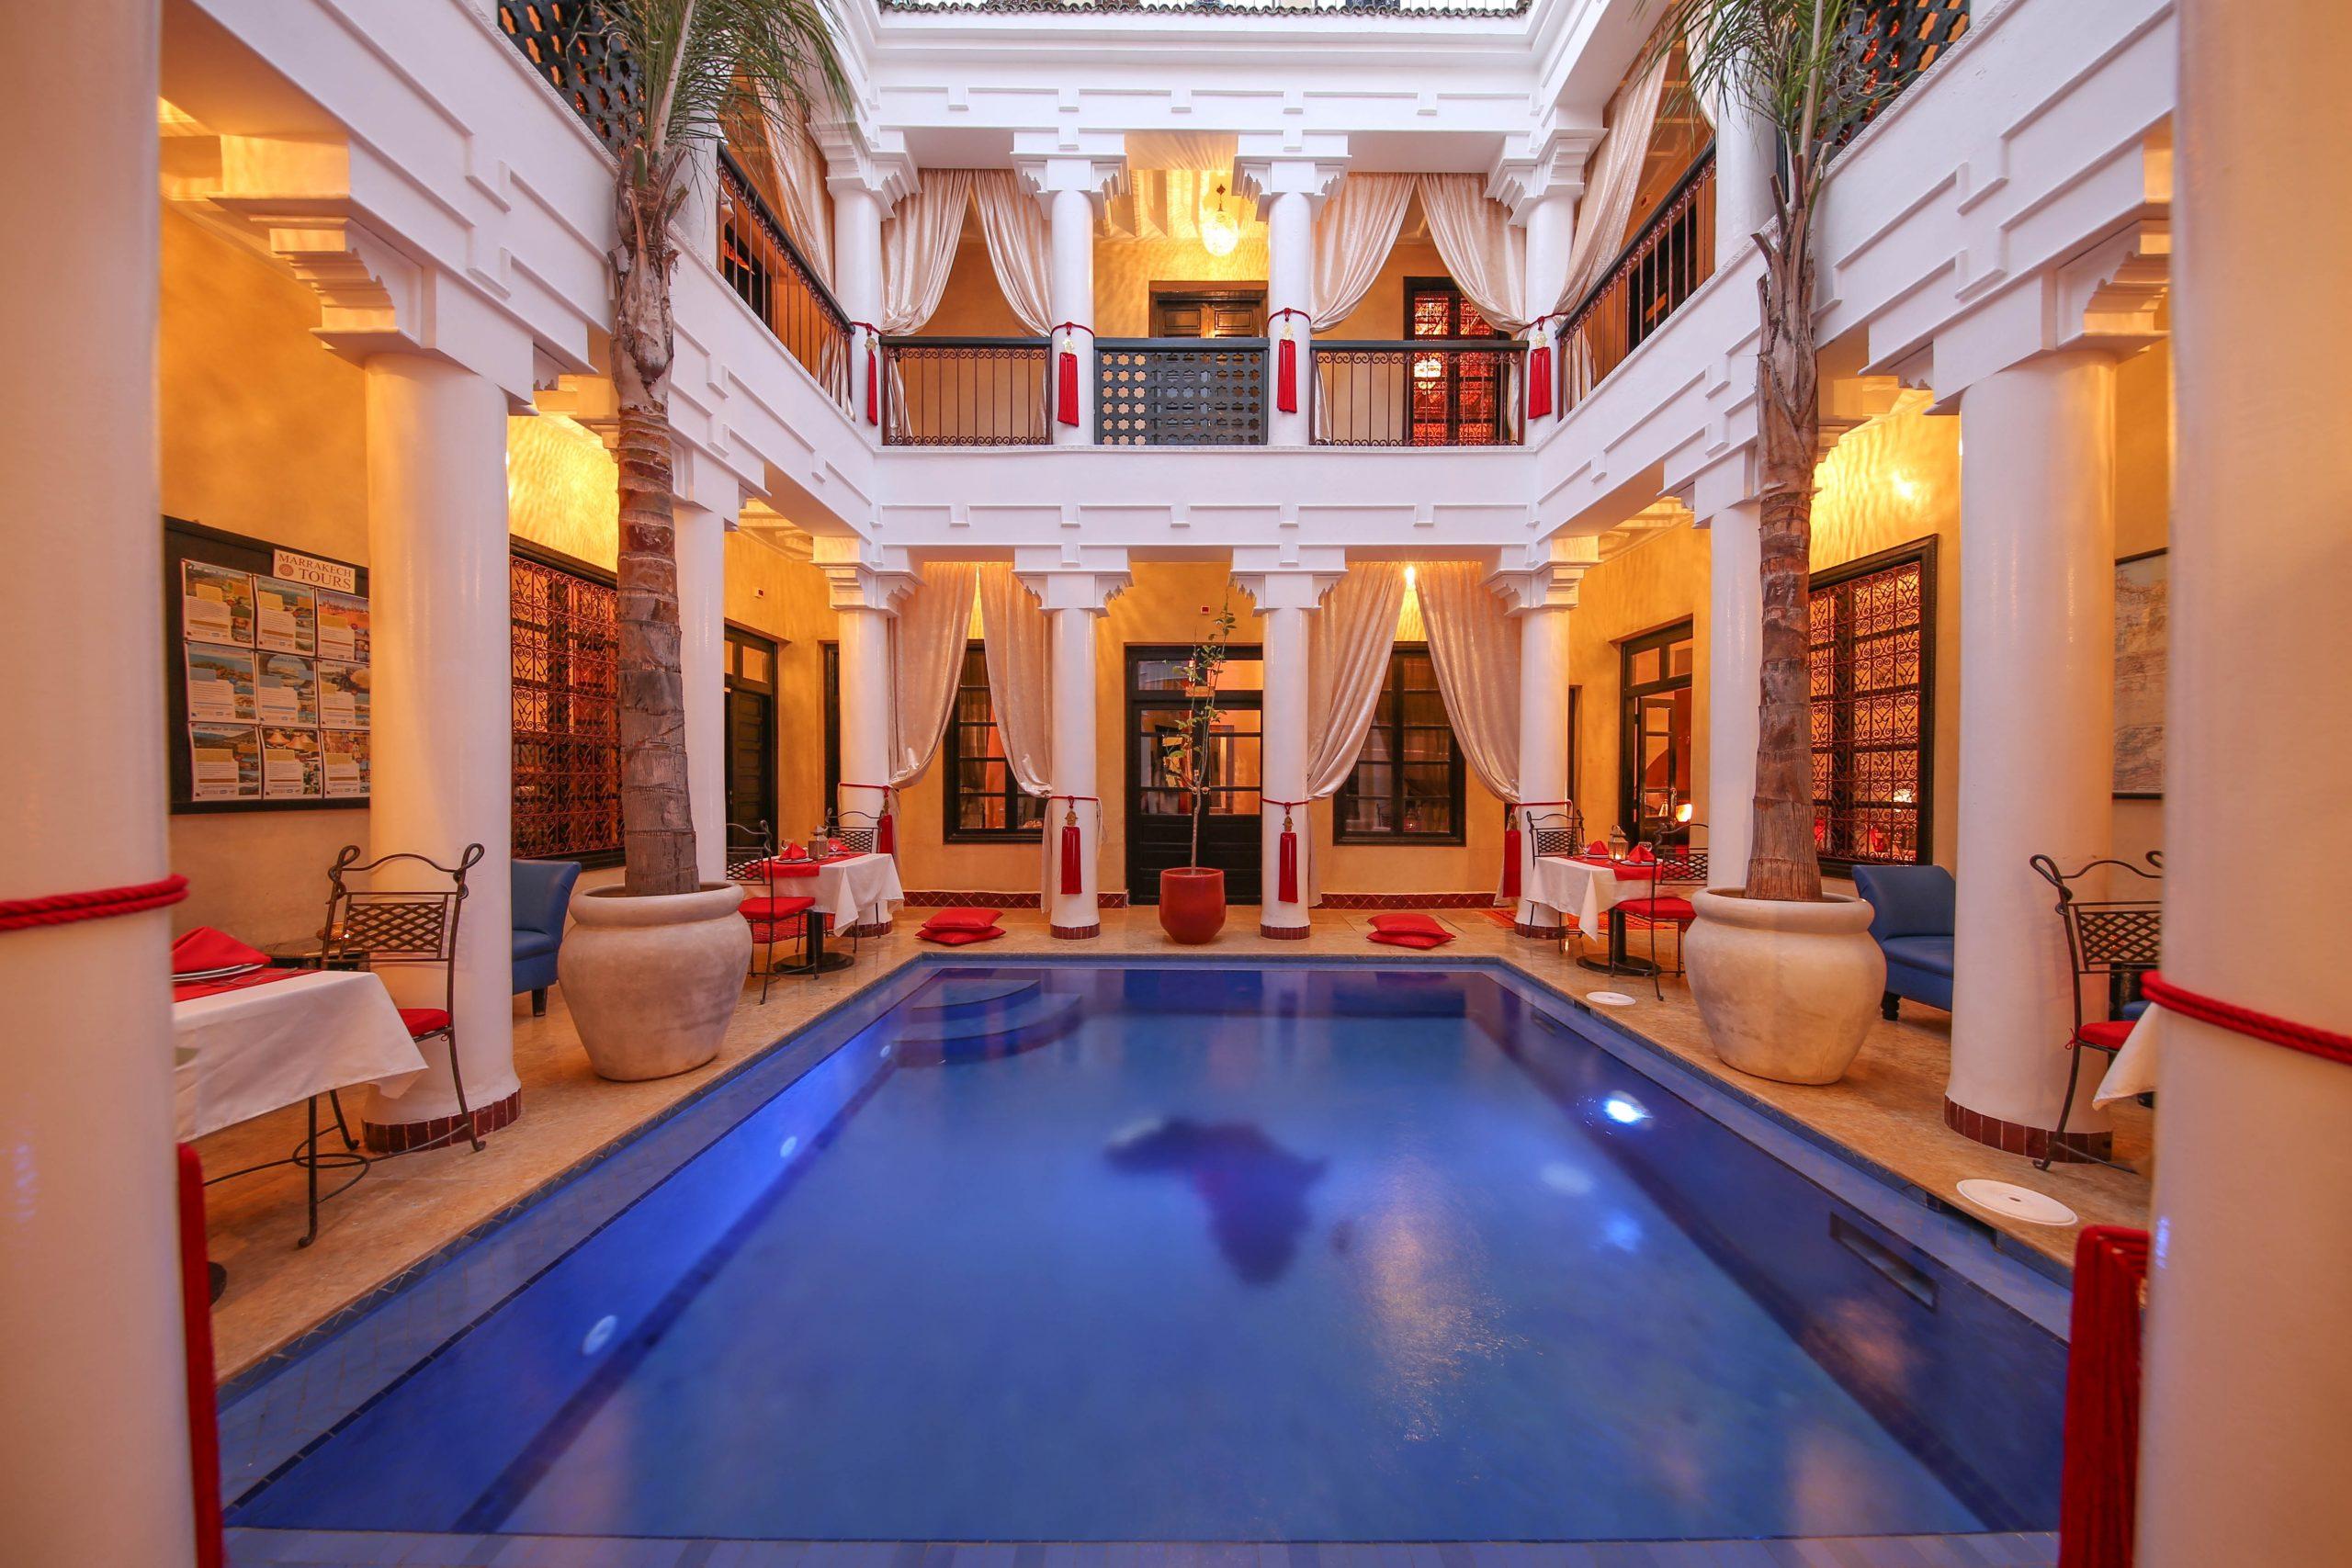 Privatisation Riad Marrakech Avec Piscine Chauffée Et Hammam (2) pour Riad Marrakech Avec Piscine